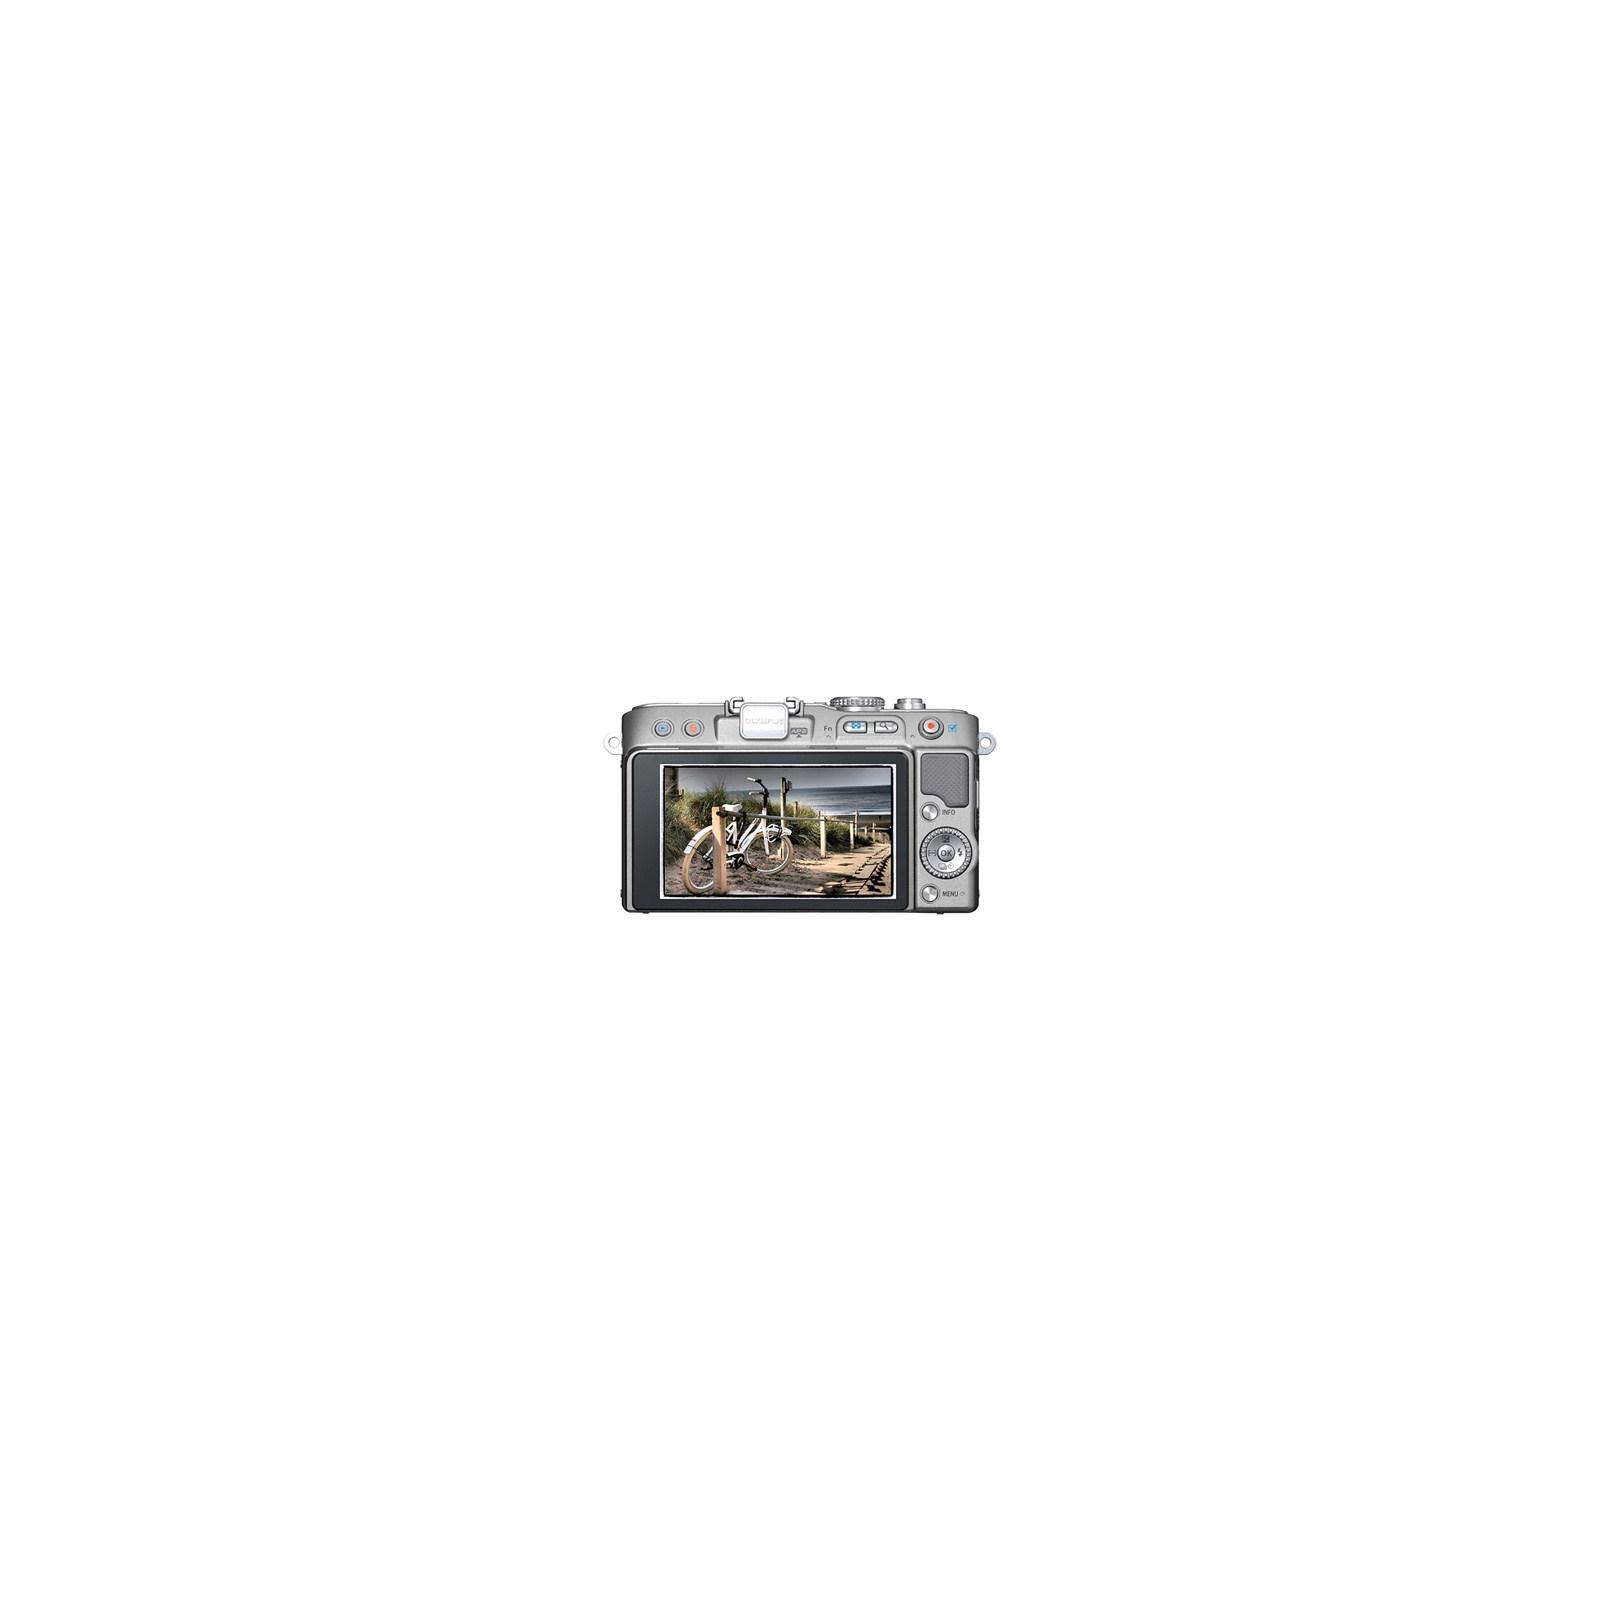 Цифровой фотоаппарат OLYMPUS PEN E-PL3 14-42 mm kit silver/silver (V20503BSE000/V205031SE000) изображение 2